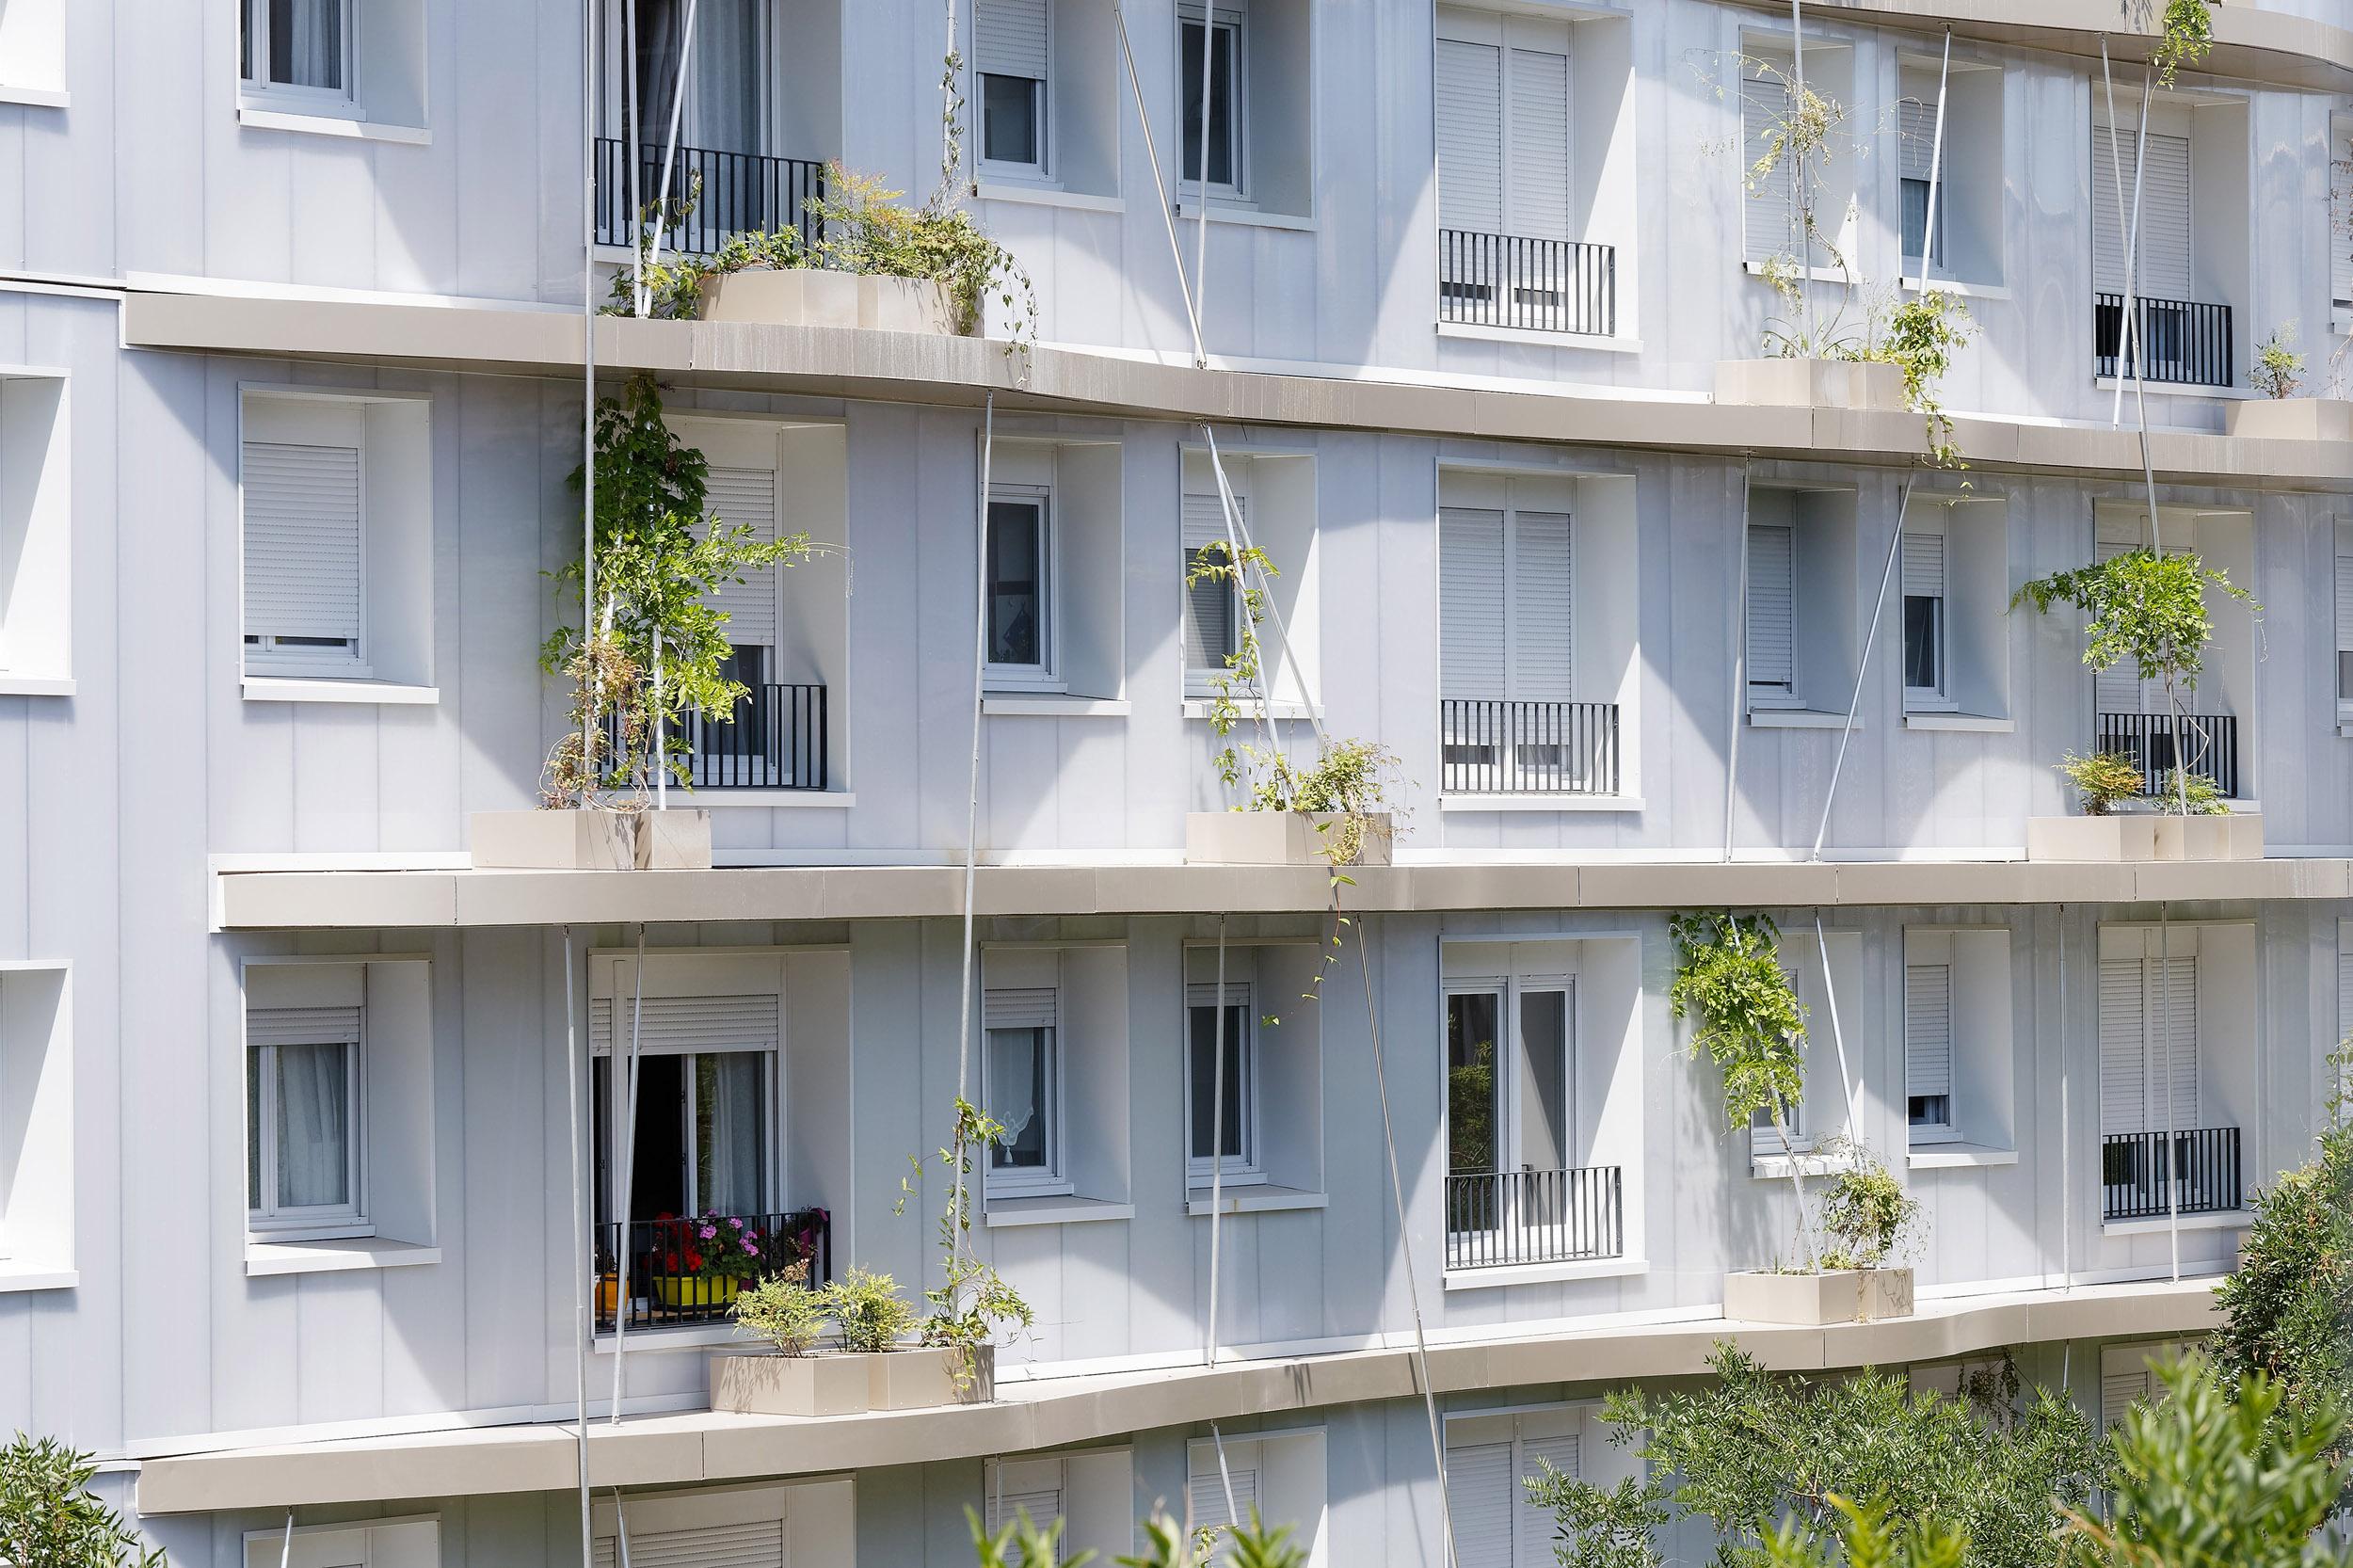 LAURENCE BELEDIN ARCHITECTURE | LOGEMENTS TOLBIAC | Daniel MOULINET